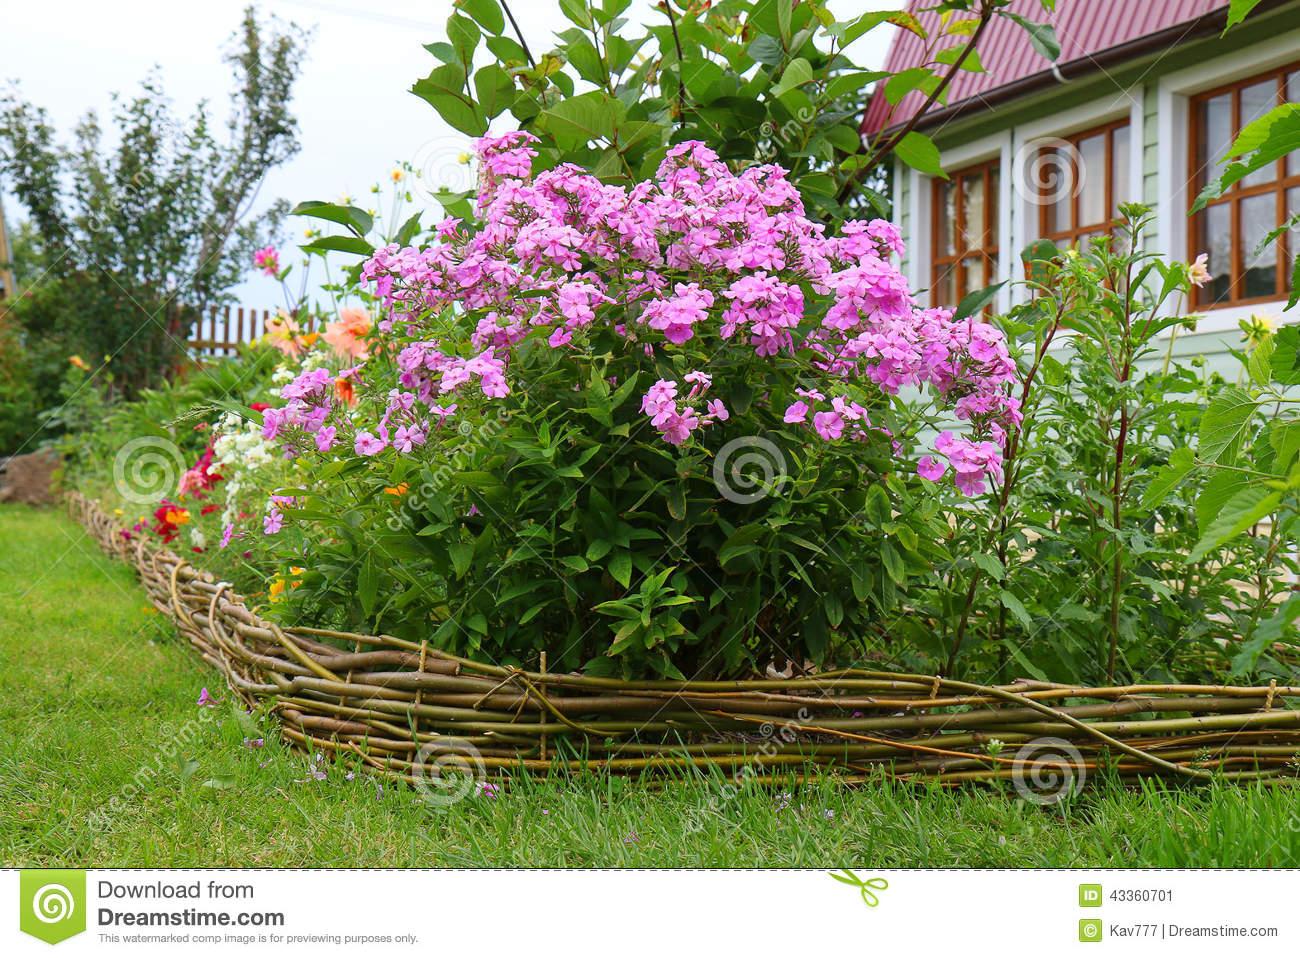 Phlox Paniculata In Bloom Stock Photo.